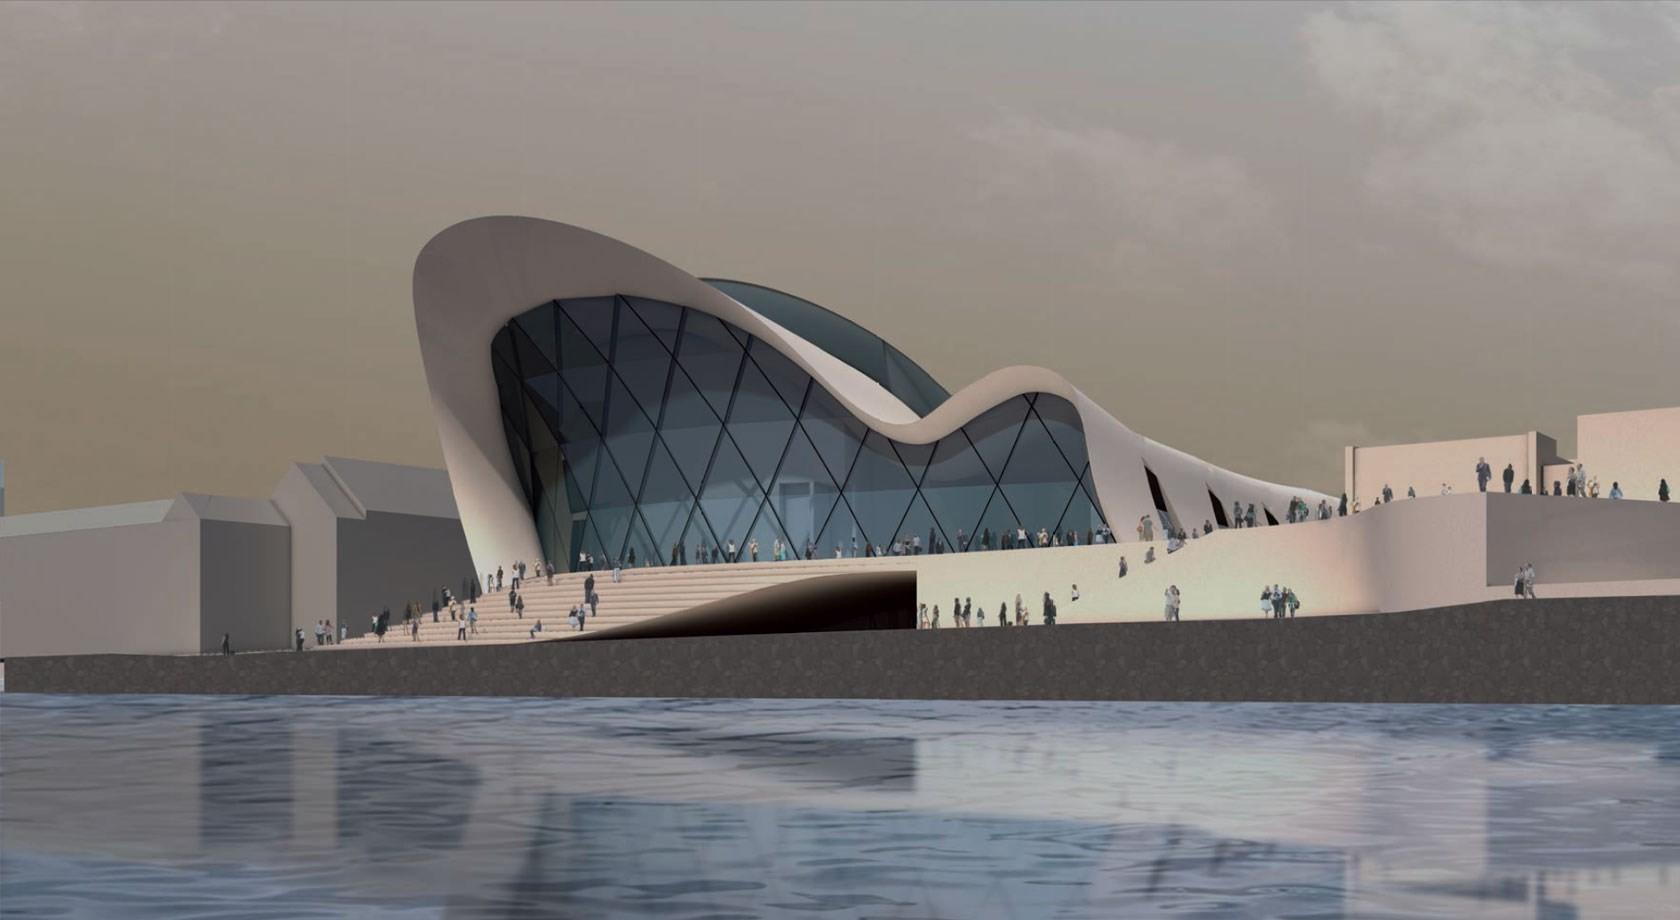 Valentiny hvp architects. Imágen cortesía de Beethoven Festspielhaus